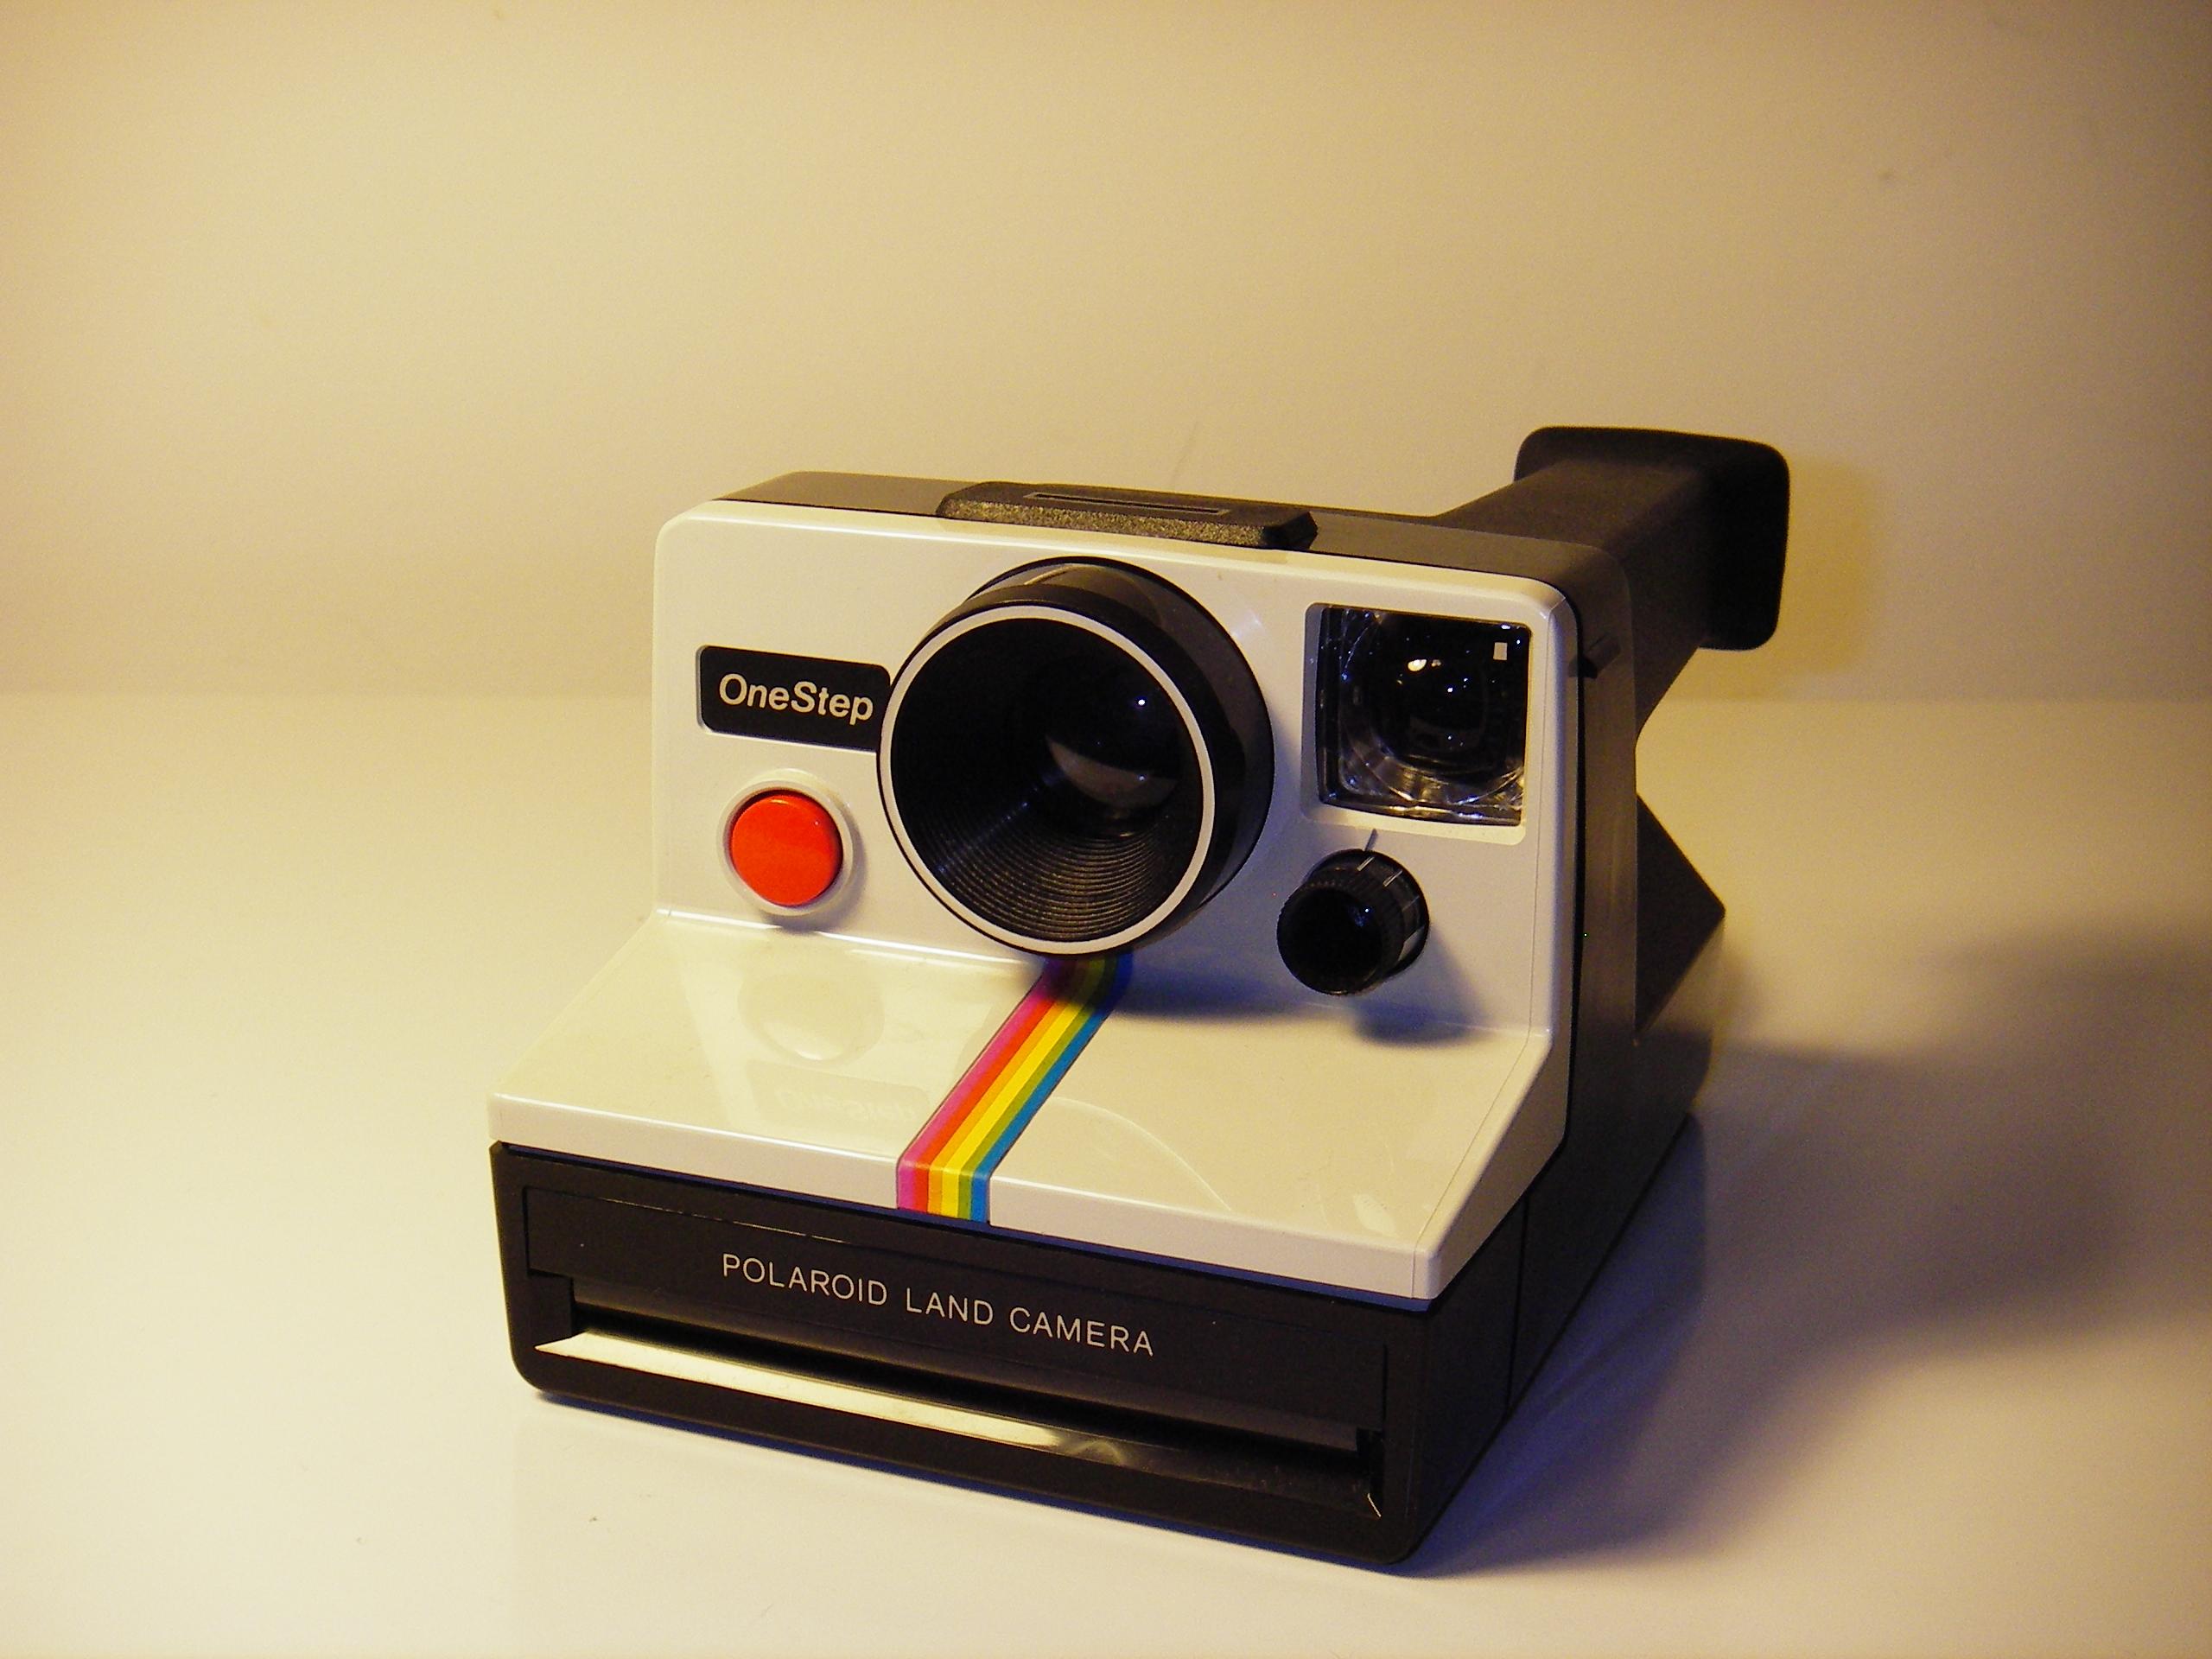 OneStep 2 From Polaroid Originals The Relaunch Of Instant Film